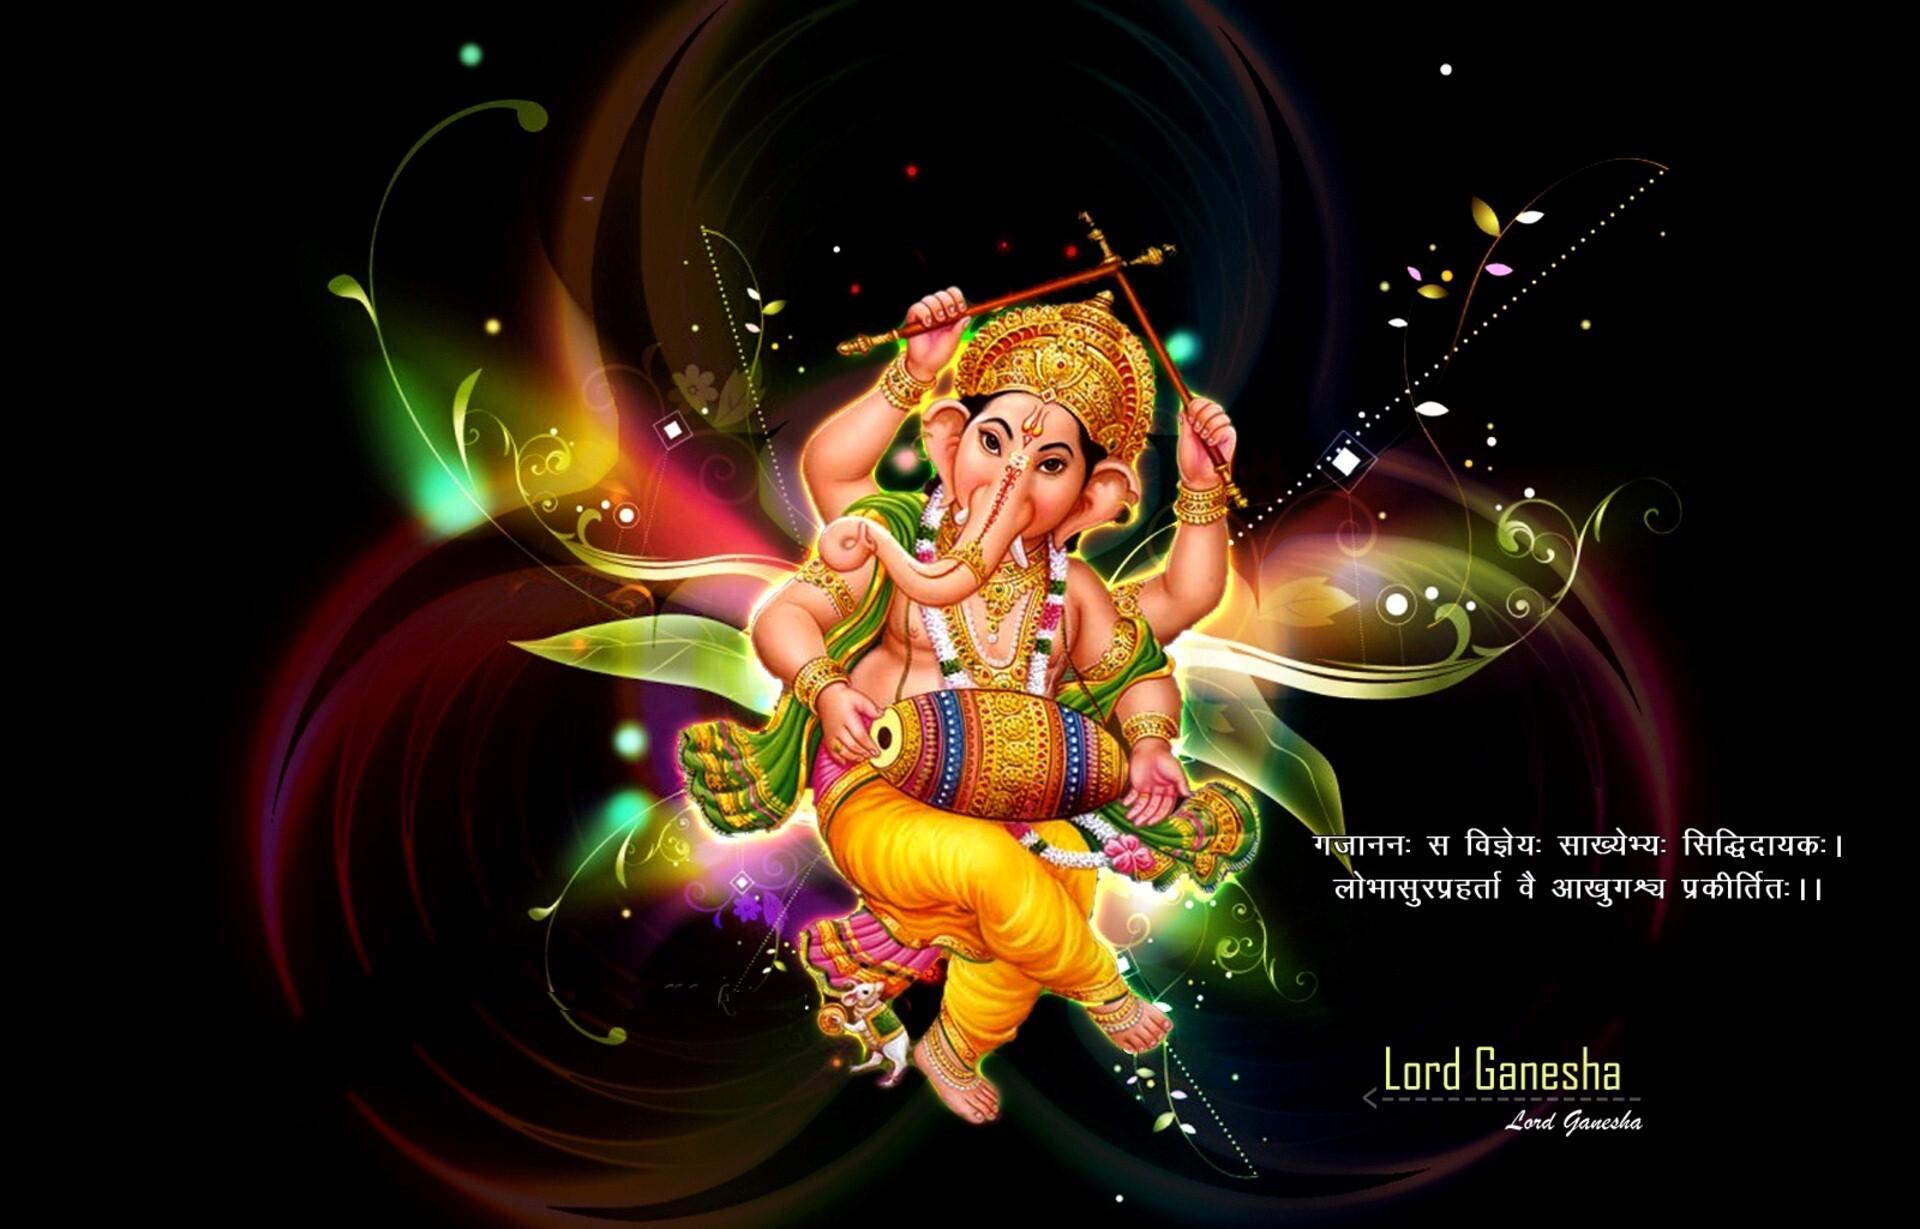 Lord Ganesha On Festival Ganesh Chaturthi